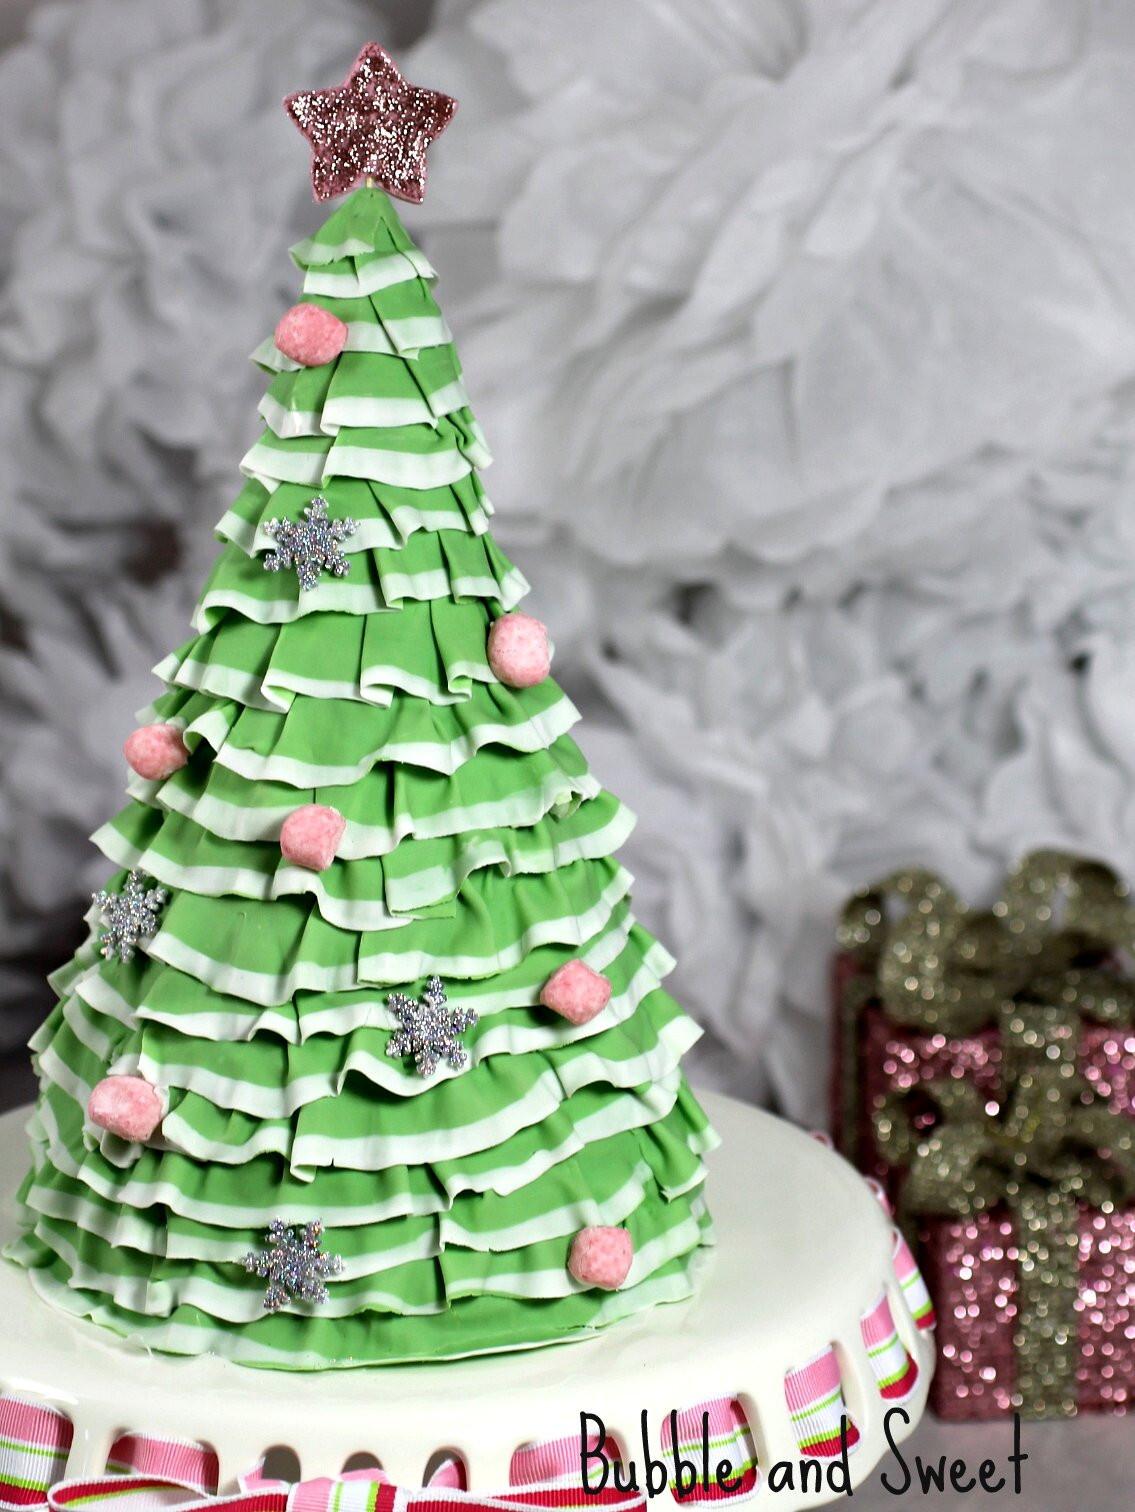 Christmas Tree Cakes  Bubble and Sweet Pretty Layered Ruffle Christmas Tree